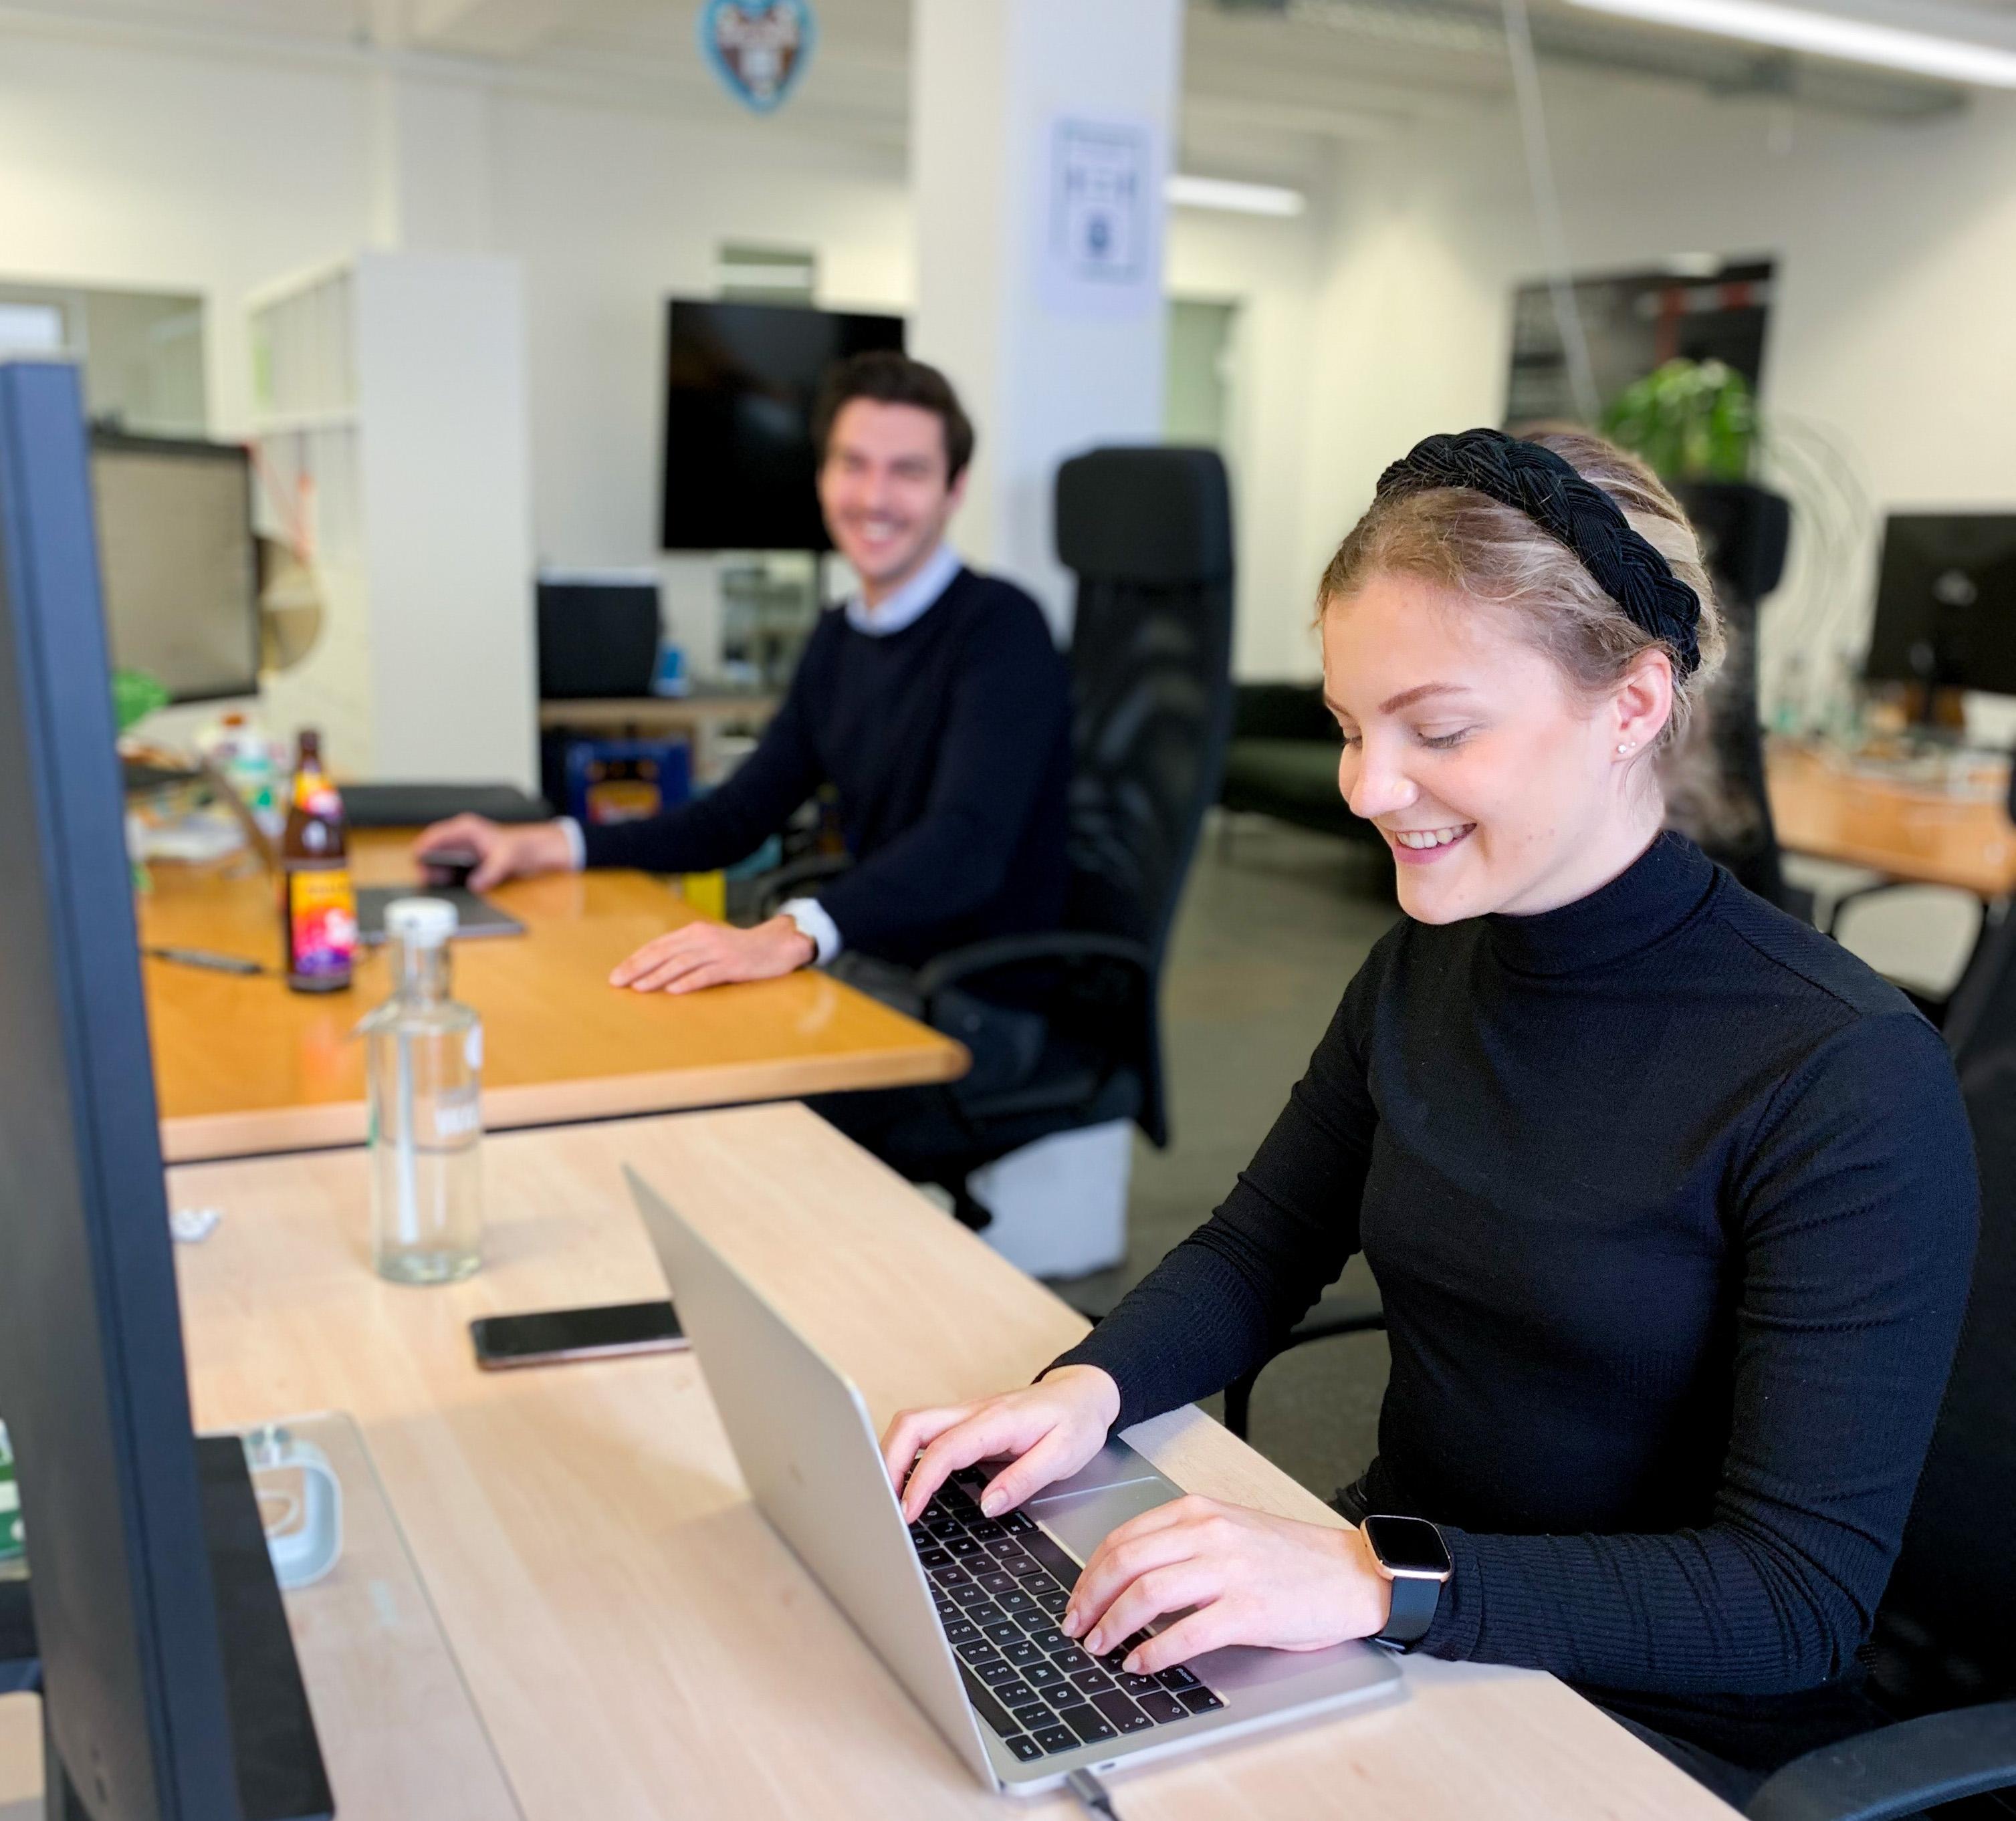 Peter Park Mobilität Startup München